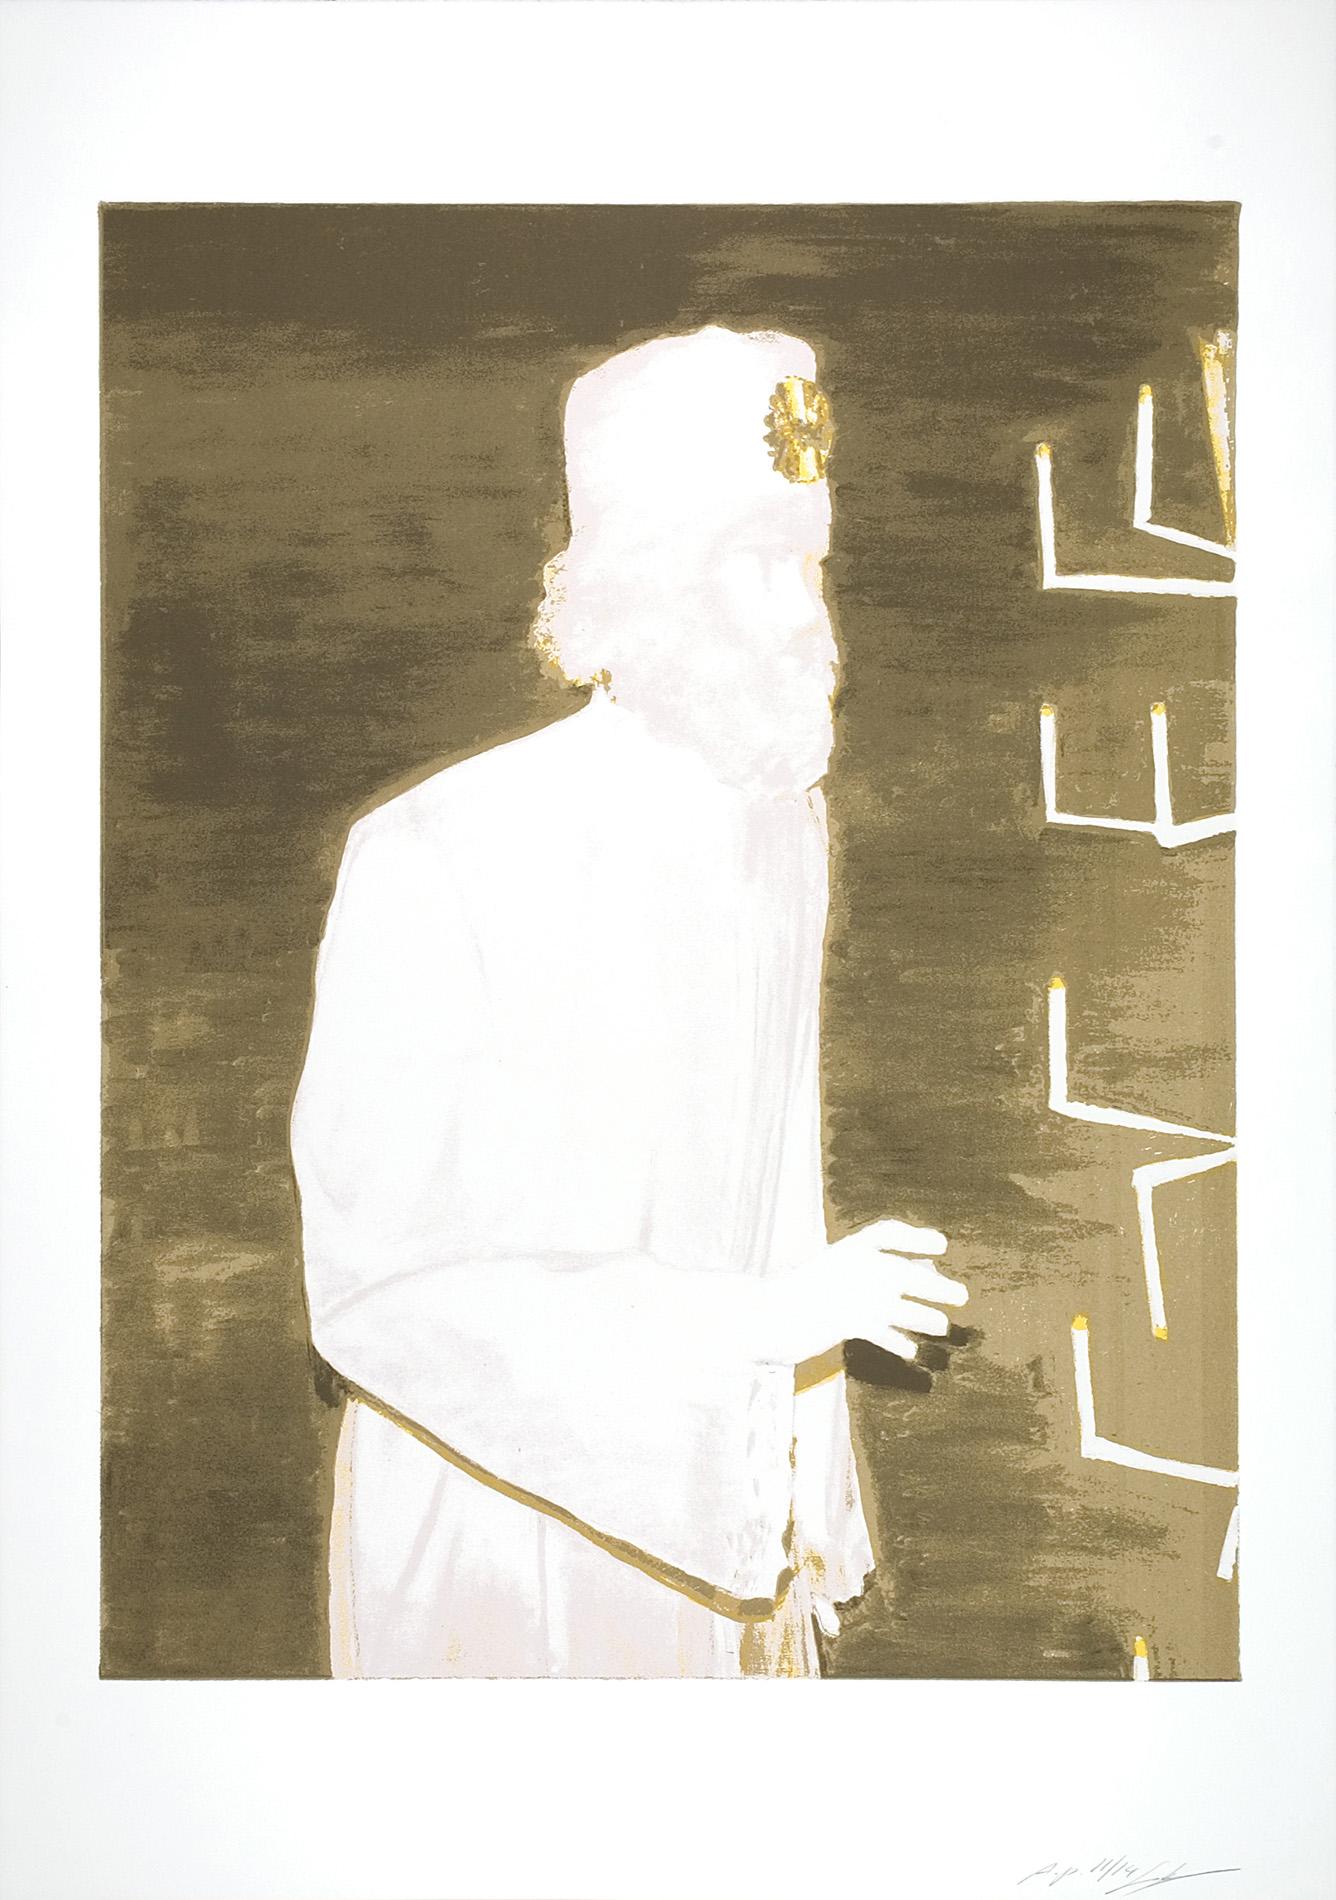 Luc Tuymans | The Worshipper 2005